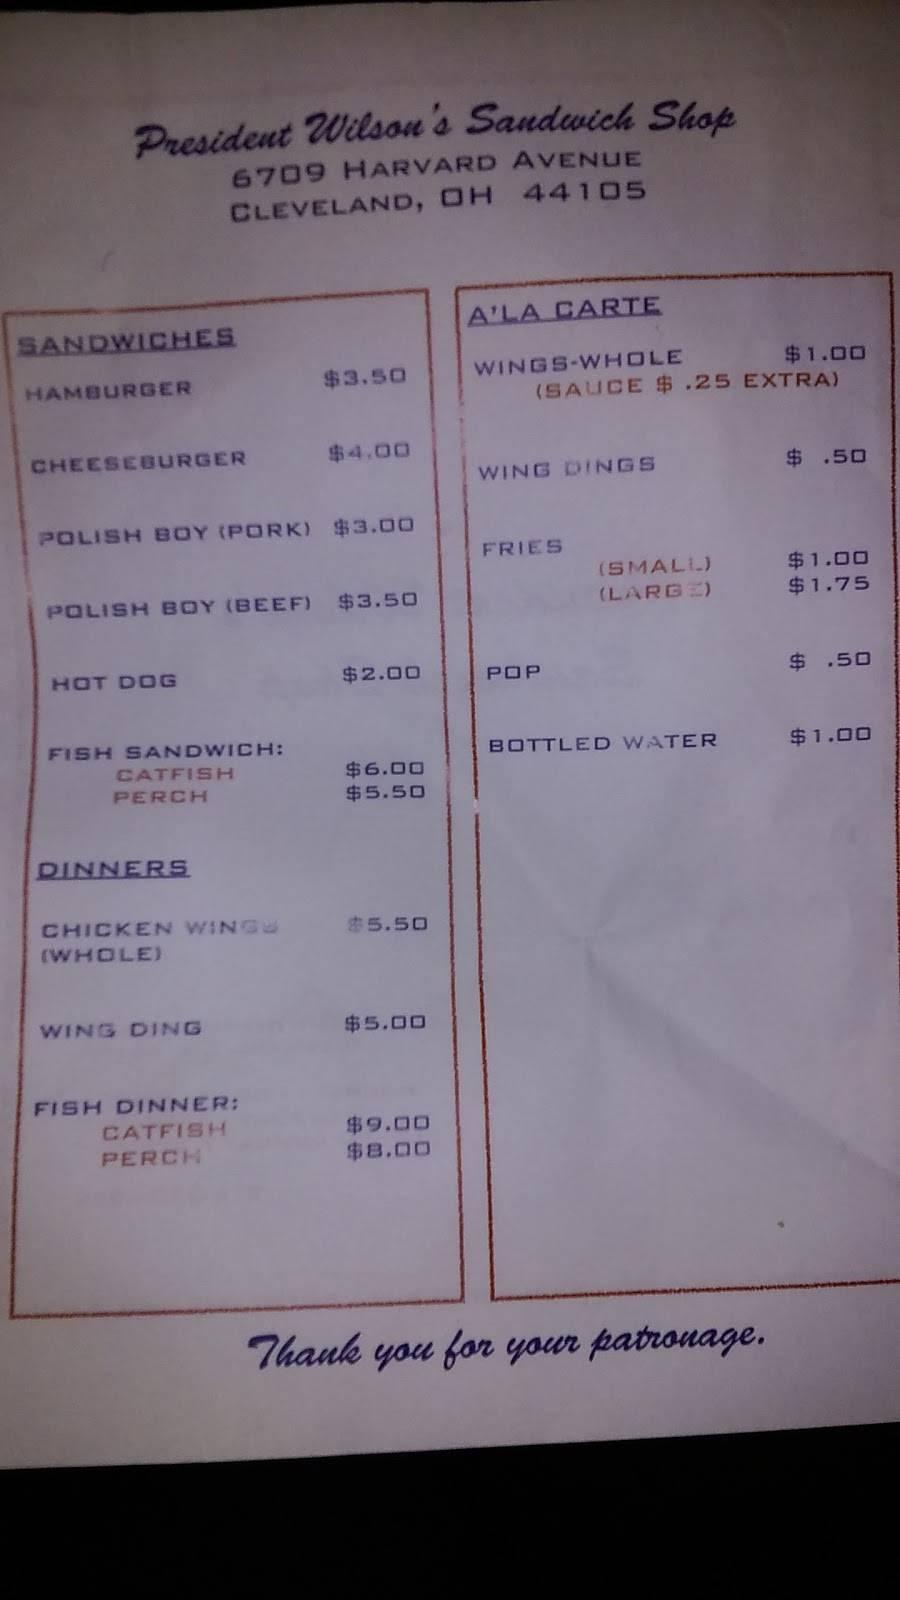 President Wilsons Sandwich Shop   restaurant   6709 Harvard Ave, Cleveland, OH 44105, USA   2163506552 OR +1 216-350-6552